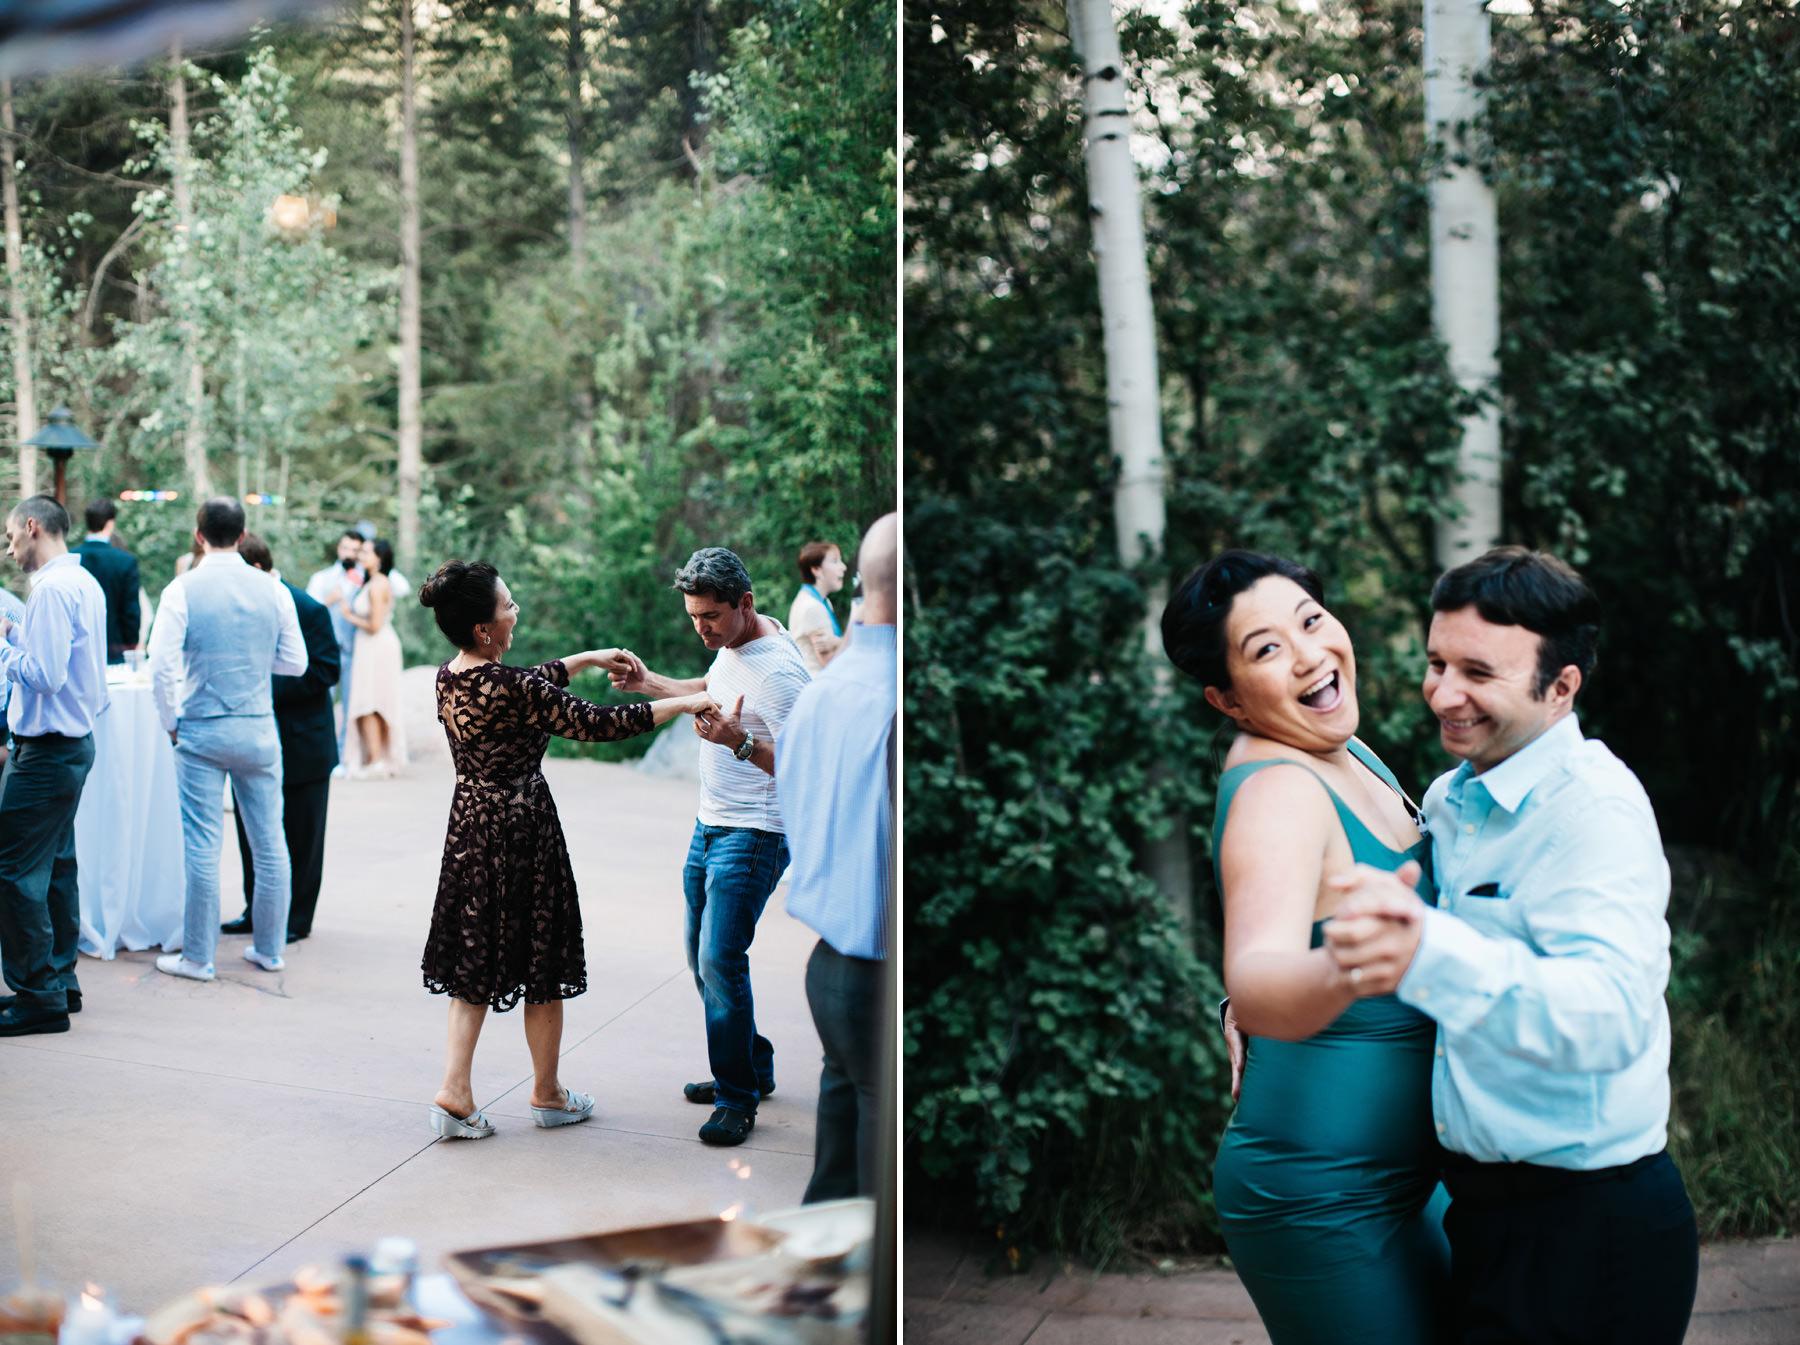 Vail Colorado Wedding Deck_ Kindling Wedding Photography67.JPG